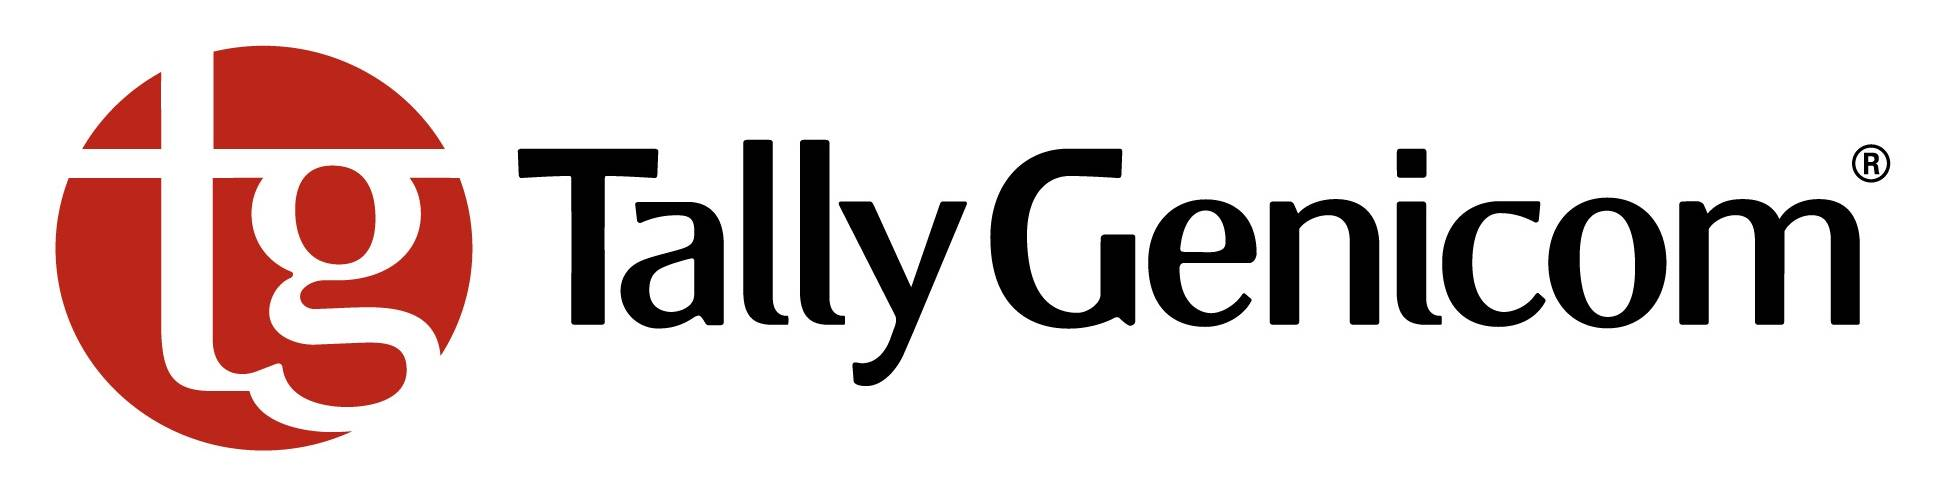 Red and black Tally Genicom logo.